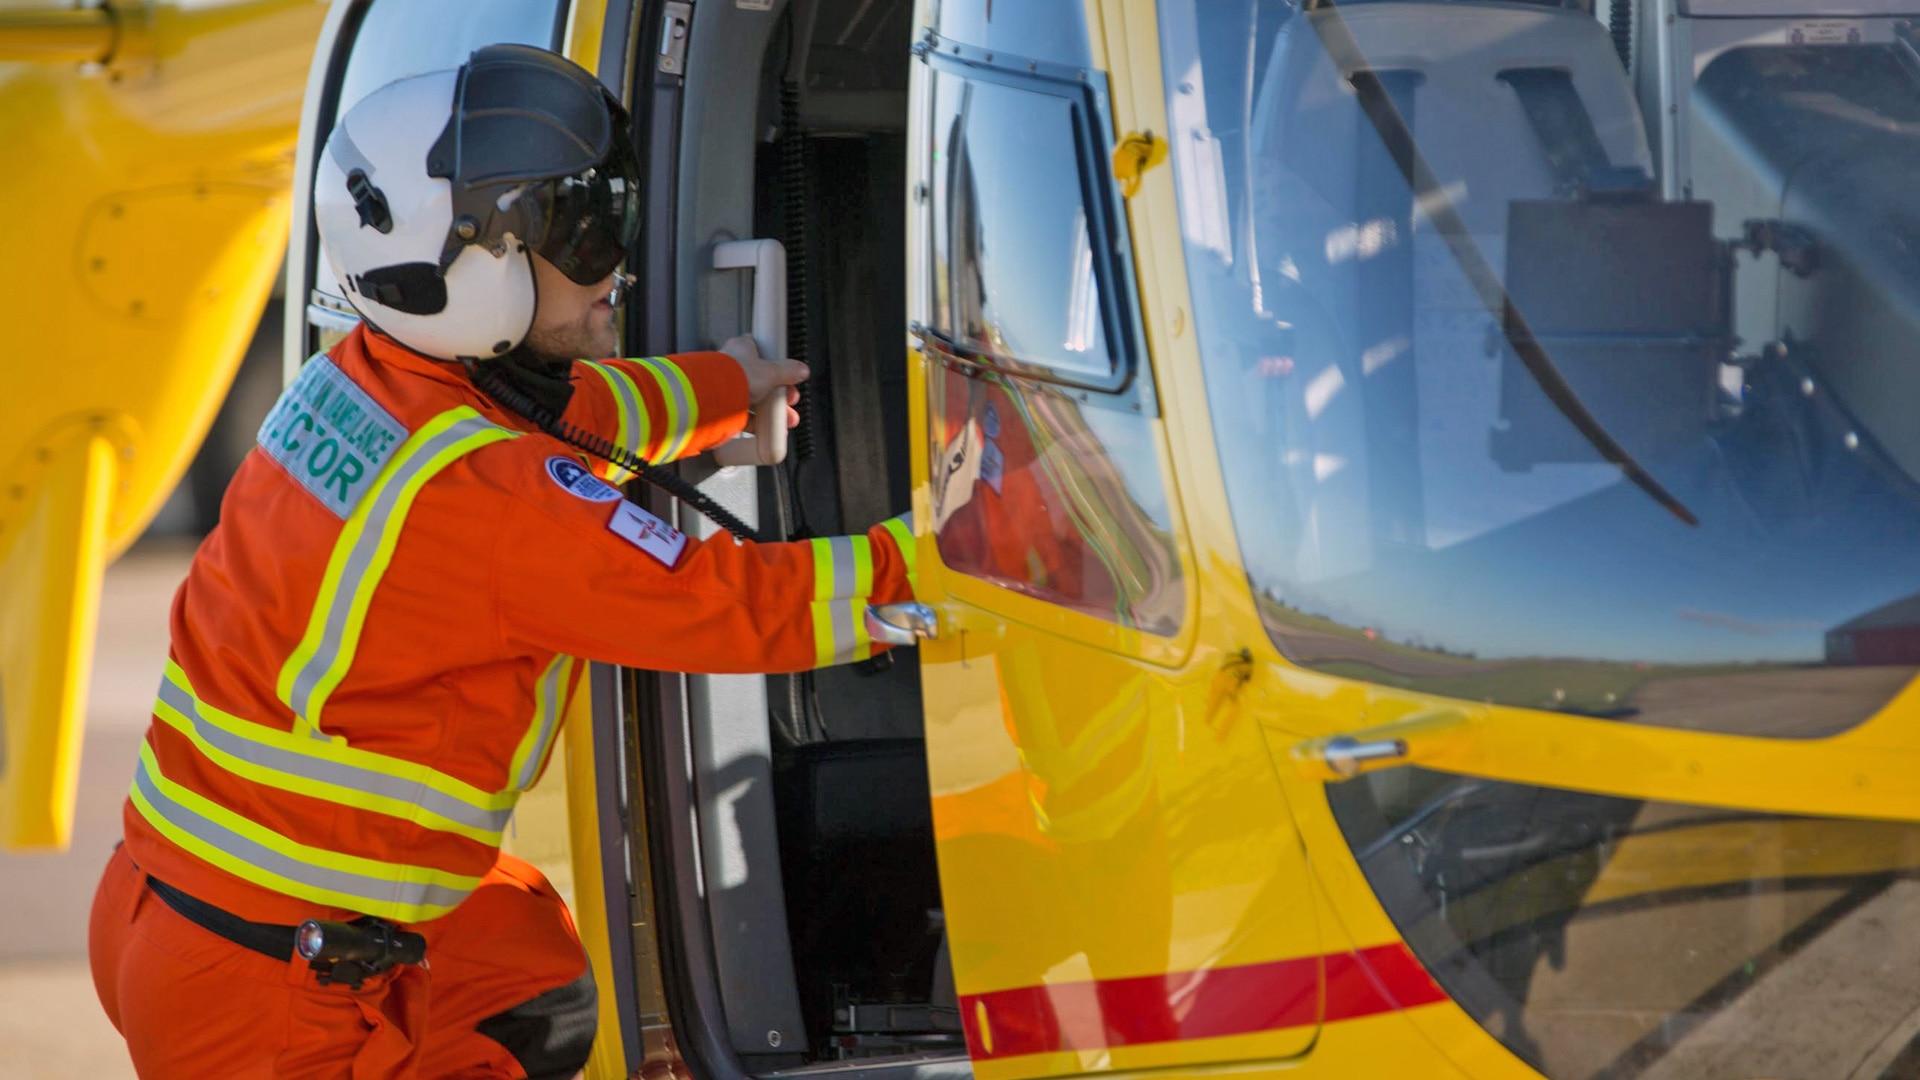 Air ambulance er series 2 episode 2